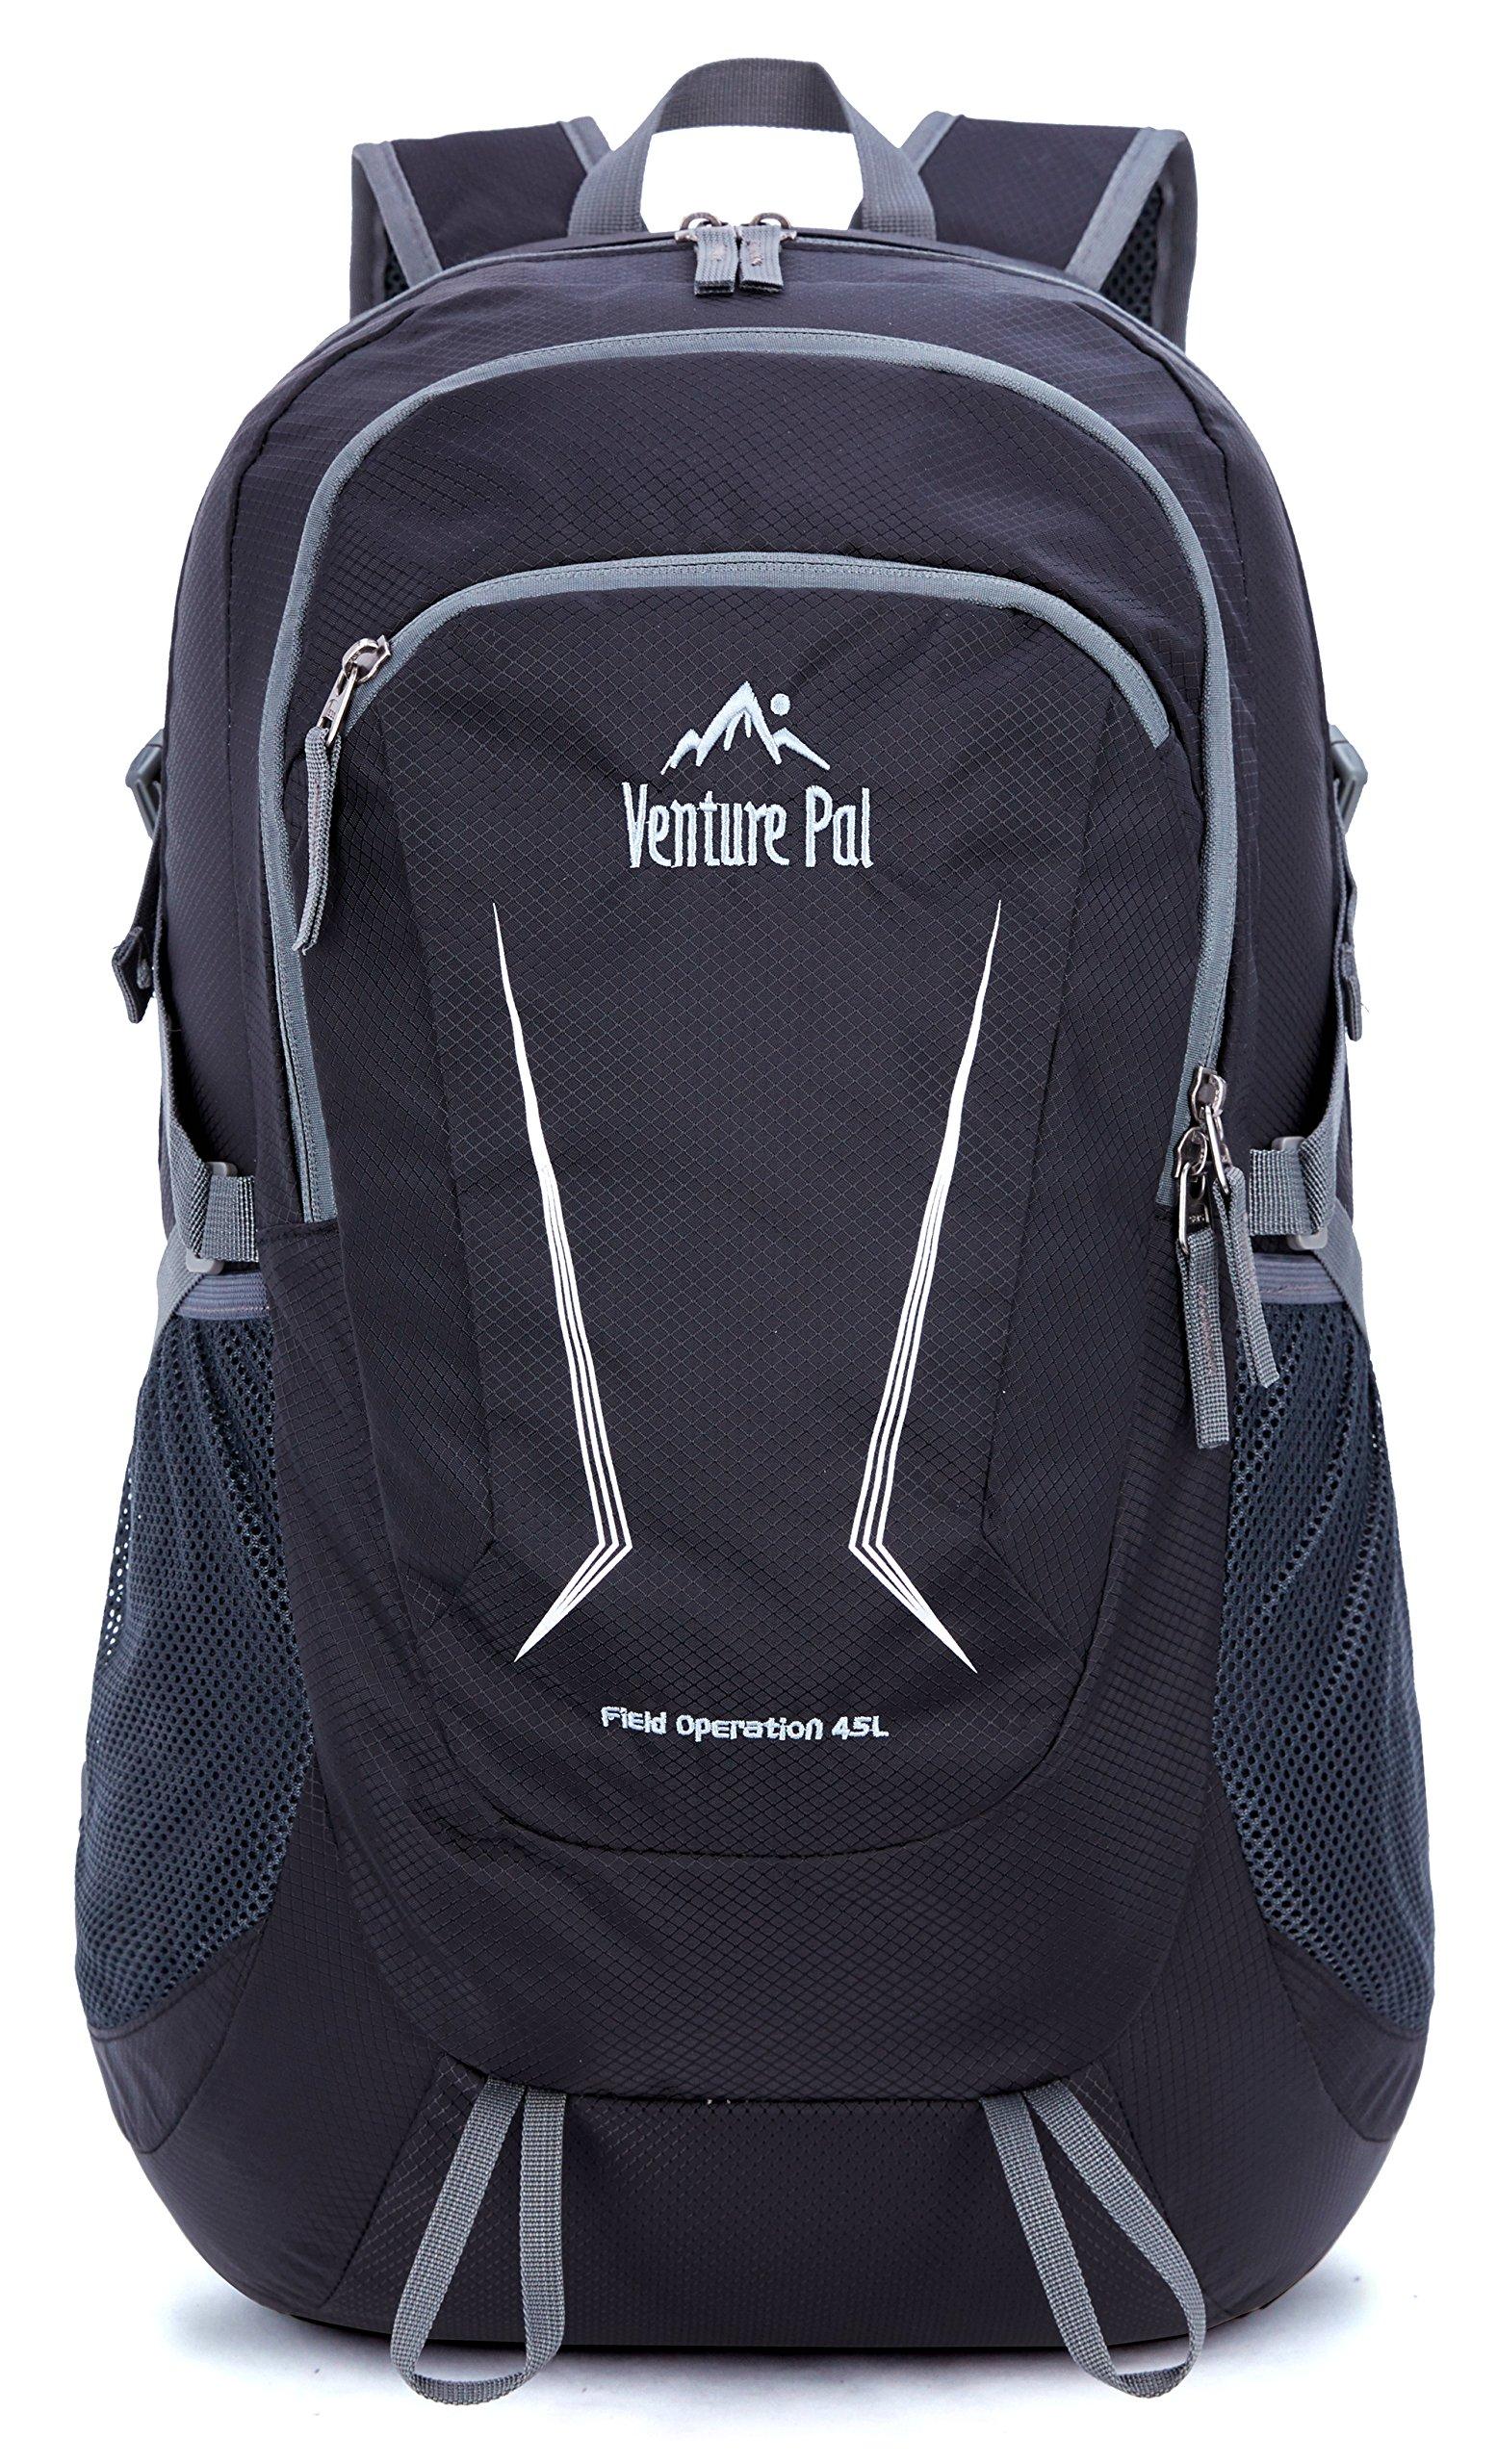 Venture Pal Large 45l Hiking Backpack Packable